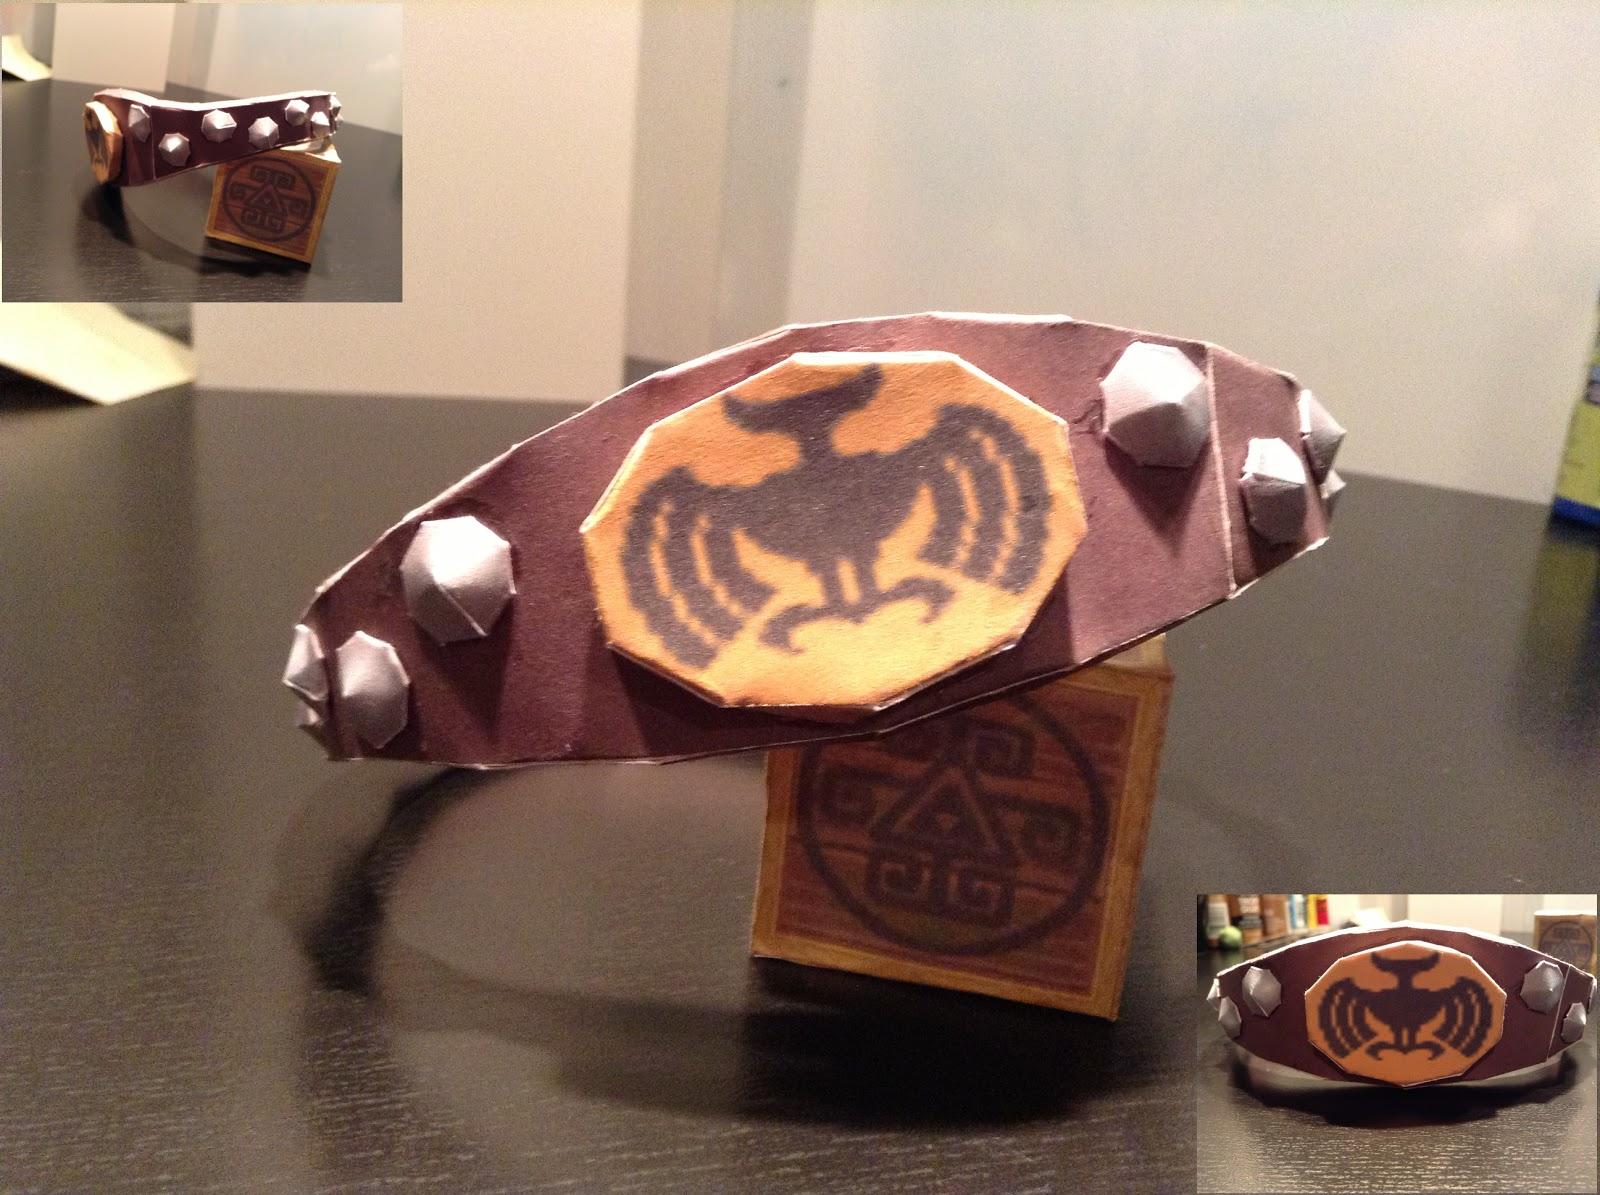 Knight's Crest Papercraft